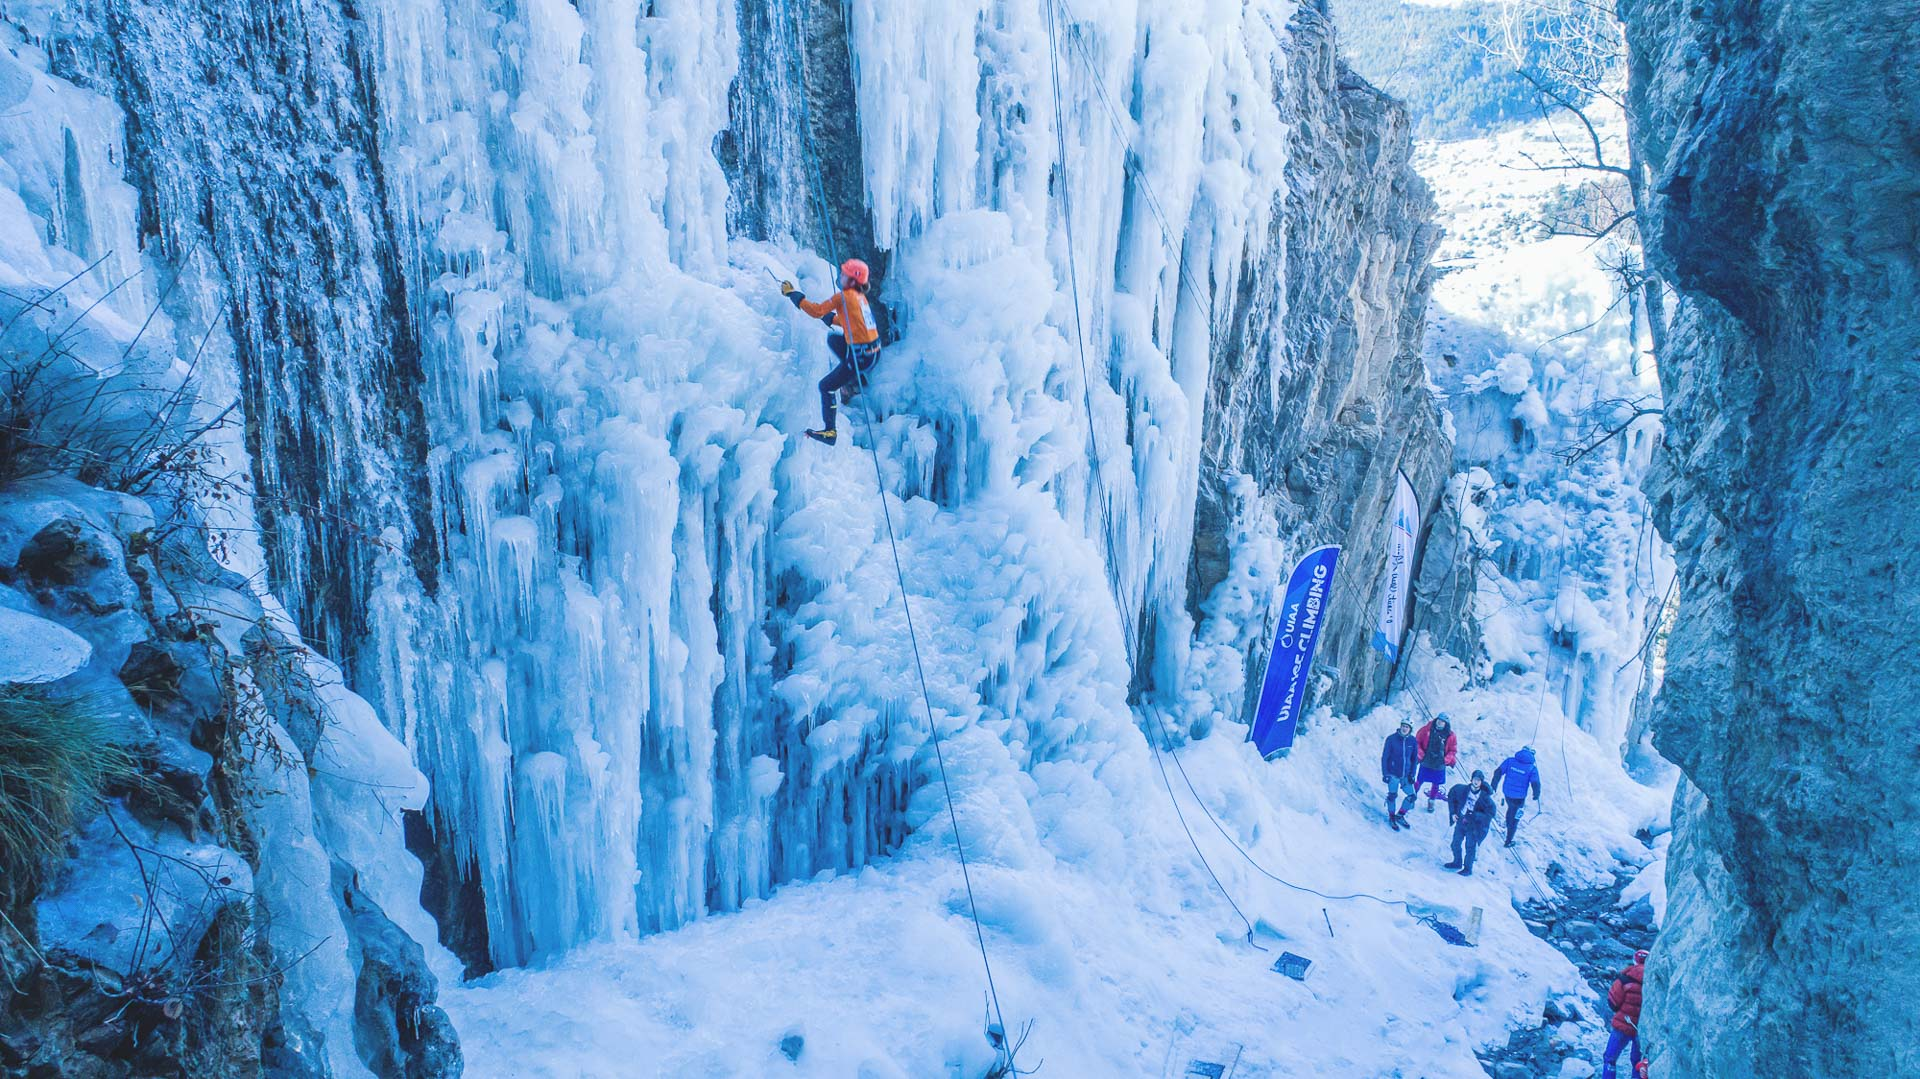 rencontre escalade sur glace)